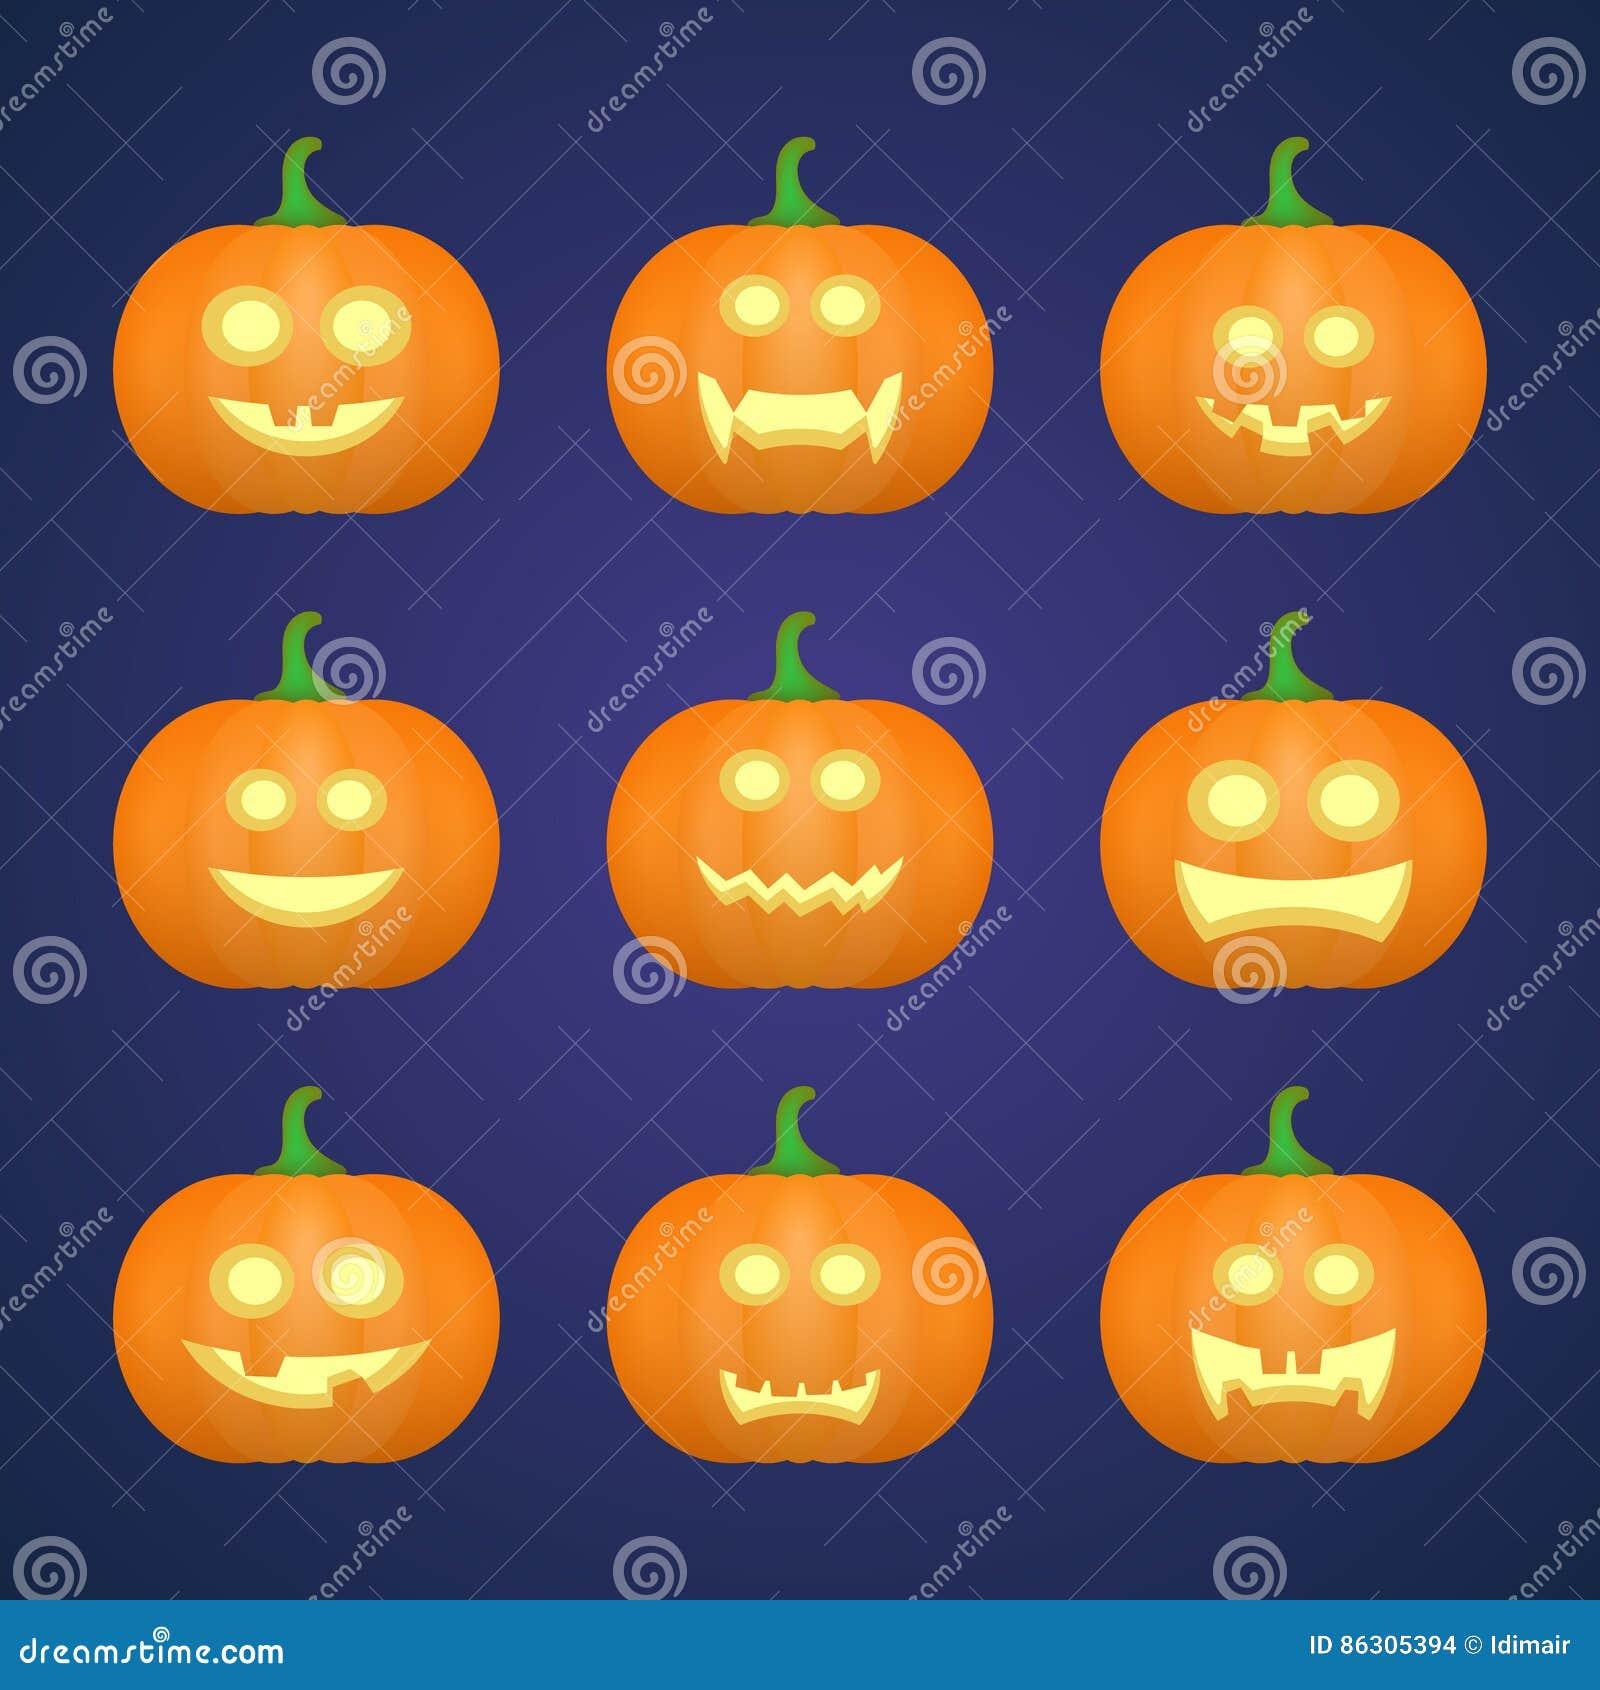 Halloween Carved Pumpkins Carved Face Emotions Set Vector Stock